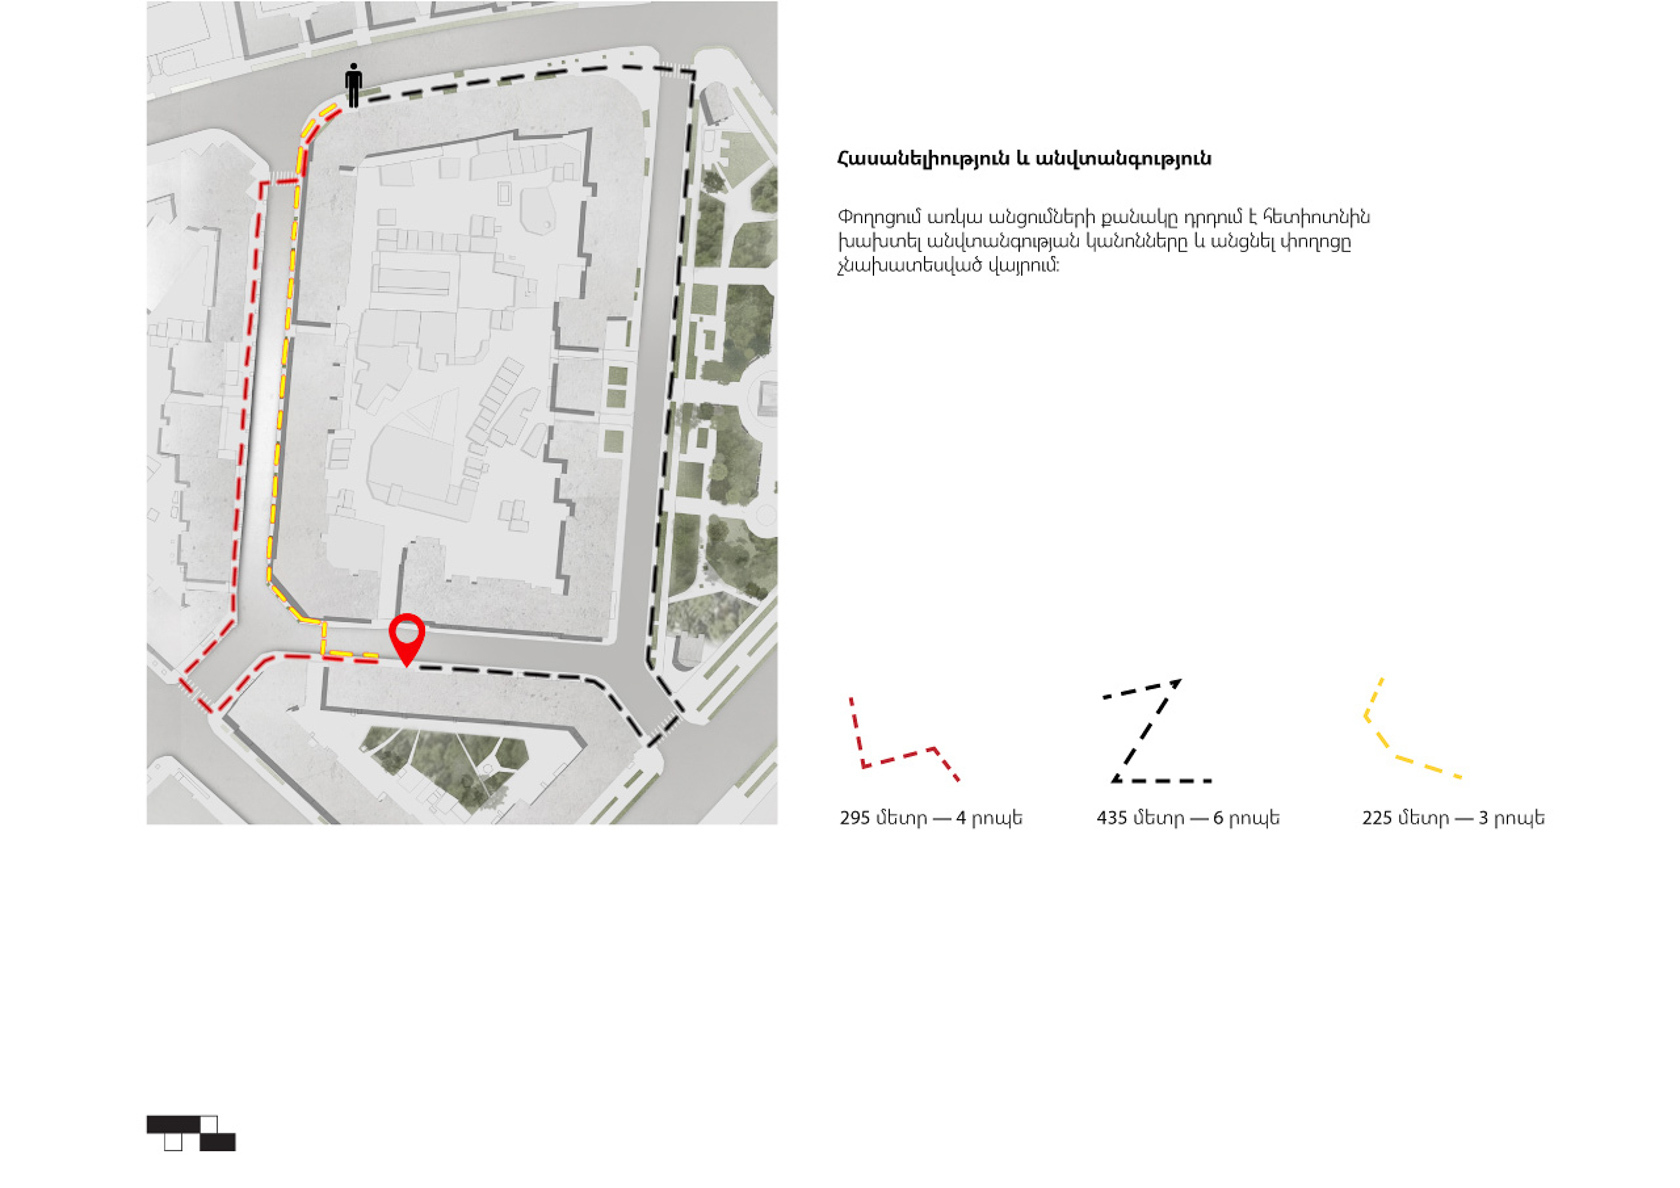 Urbanista TL bureau Spendiaryan Zoryan streets reconstruction Ուրբանիստա Սպենդիարյան Զորյան Երևան Yerevan